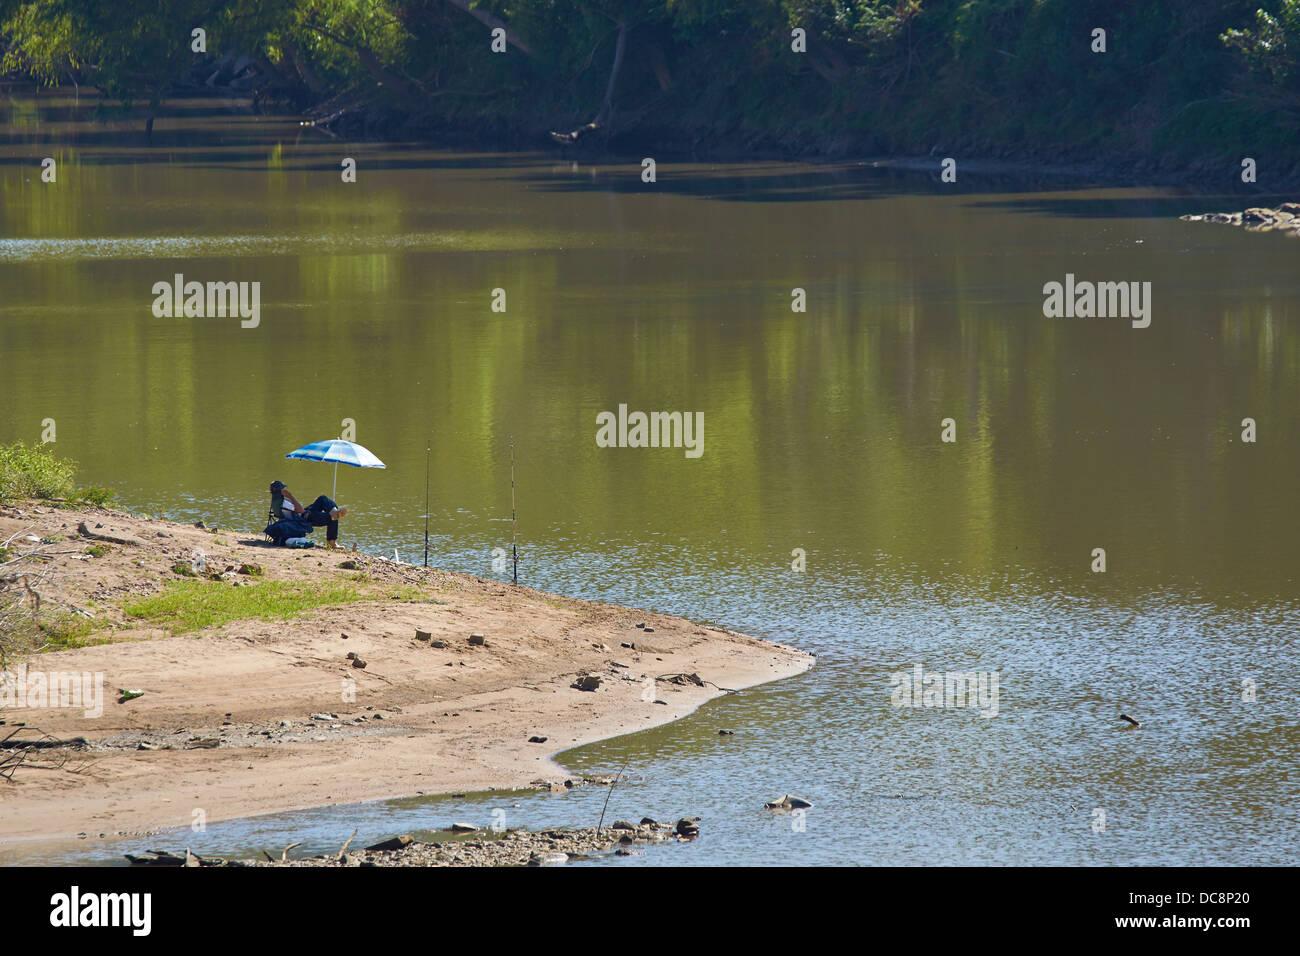 Pesca relajado Imagen De Stock